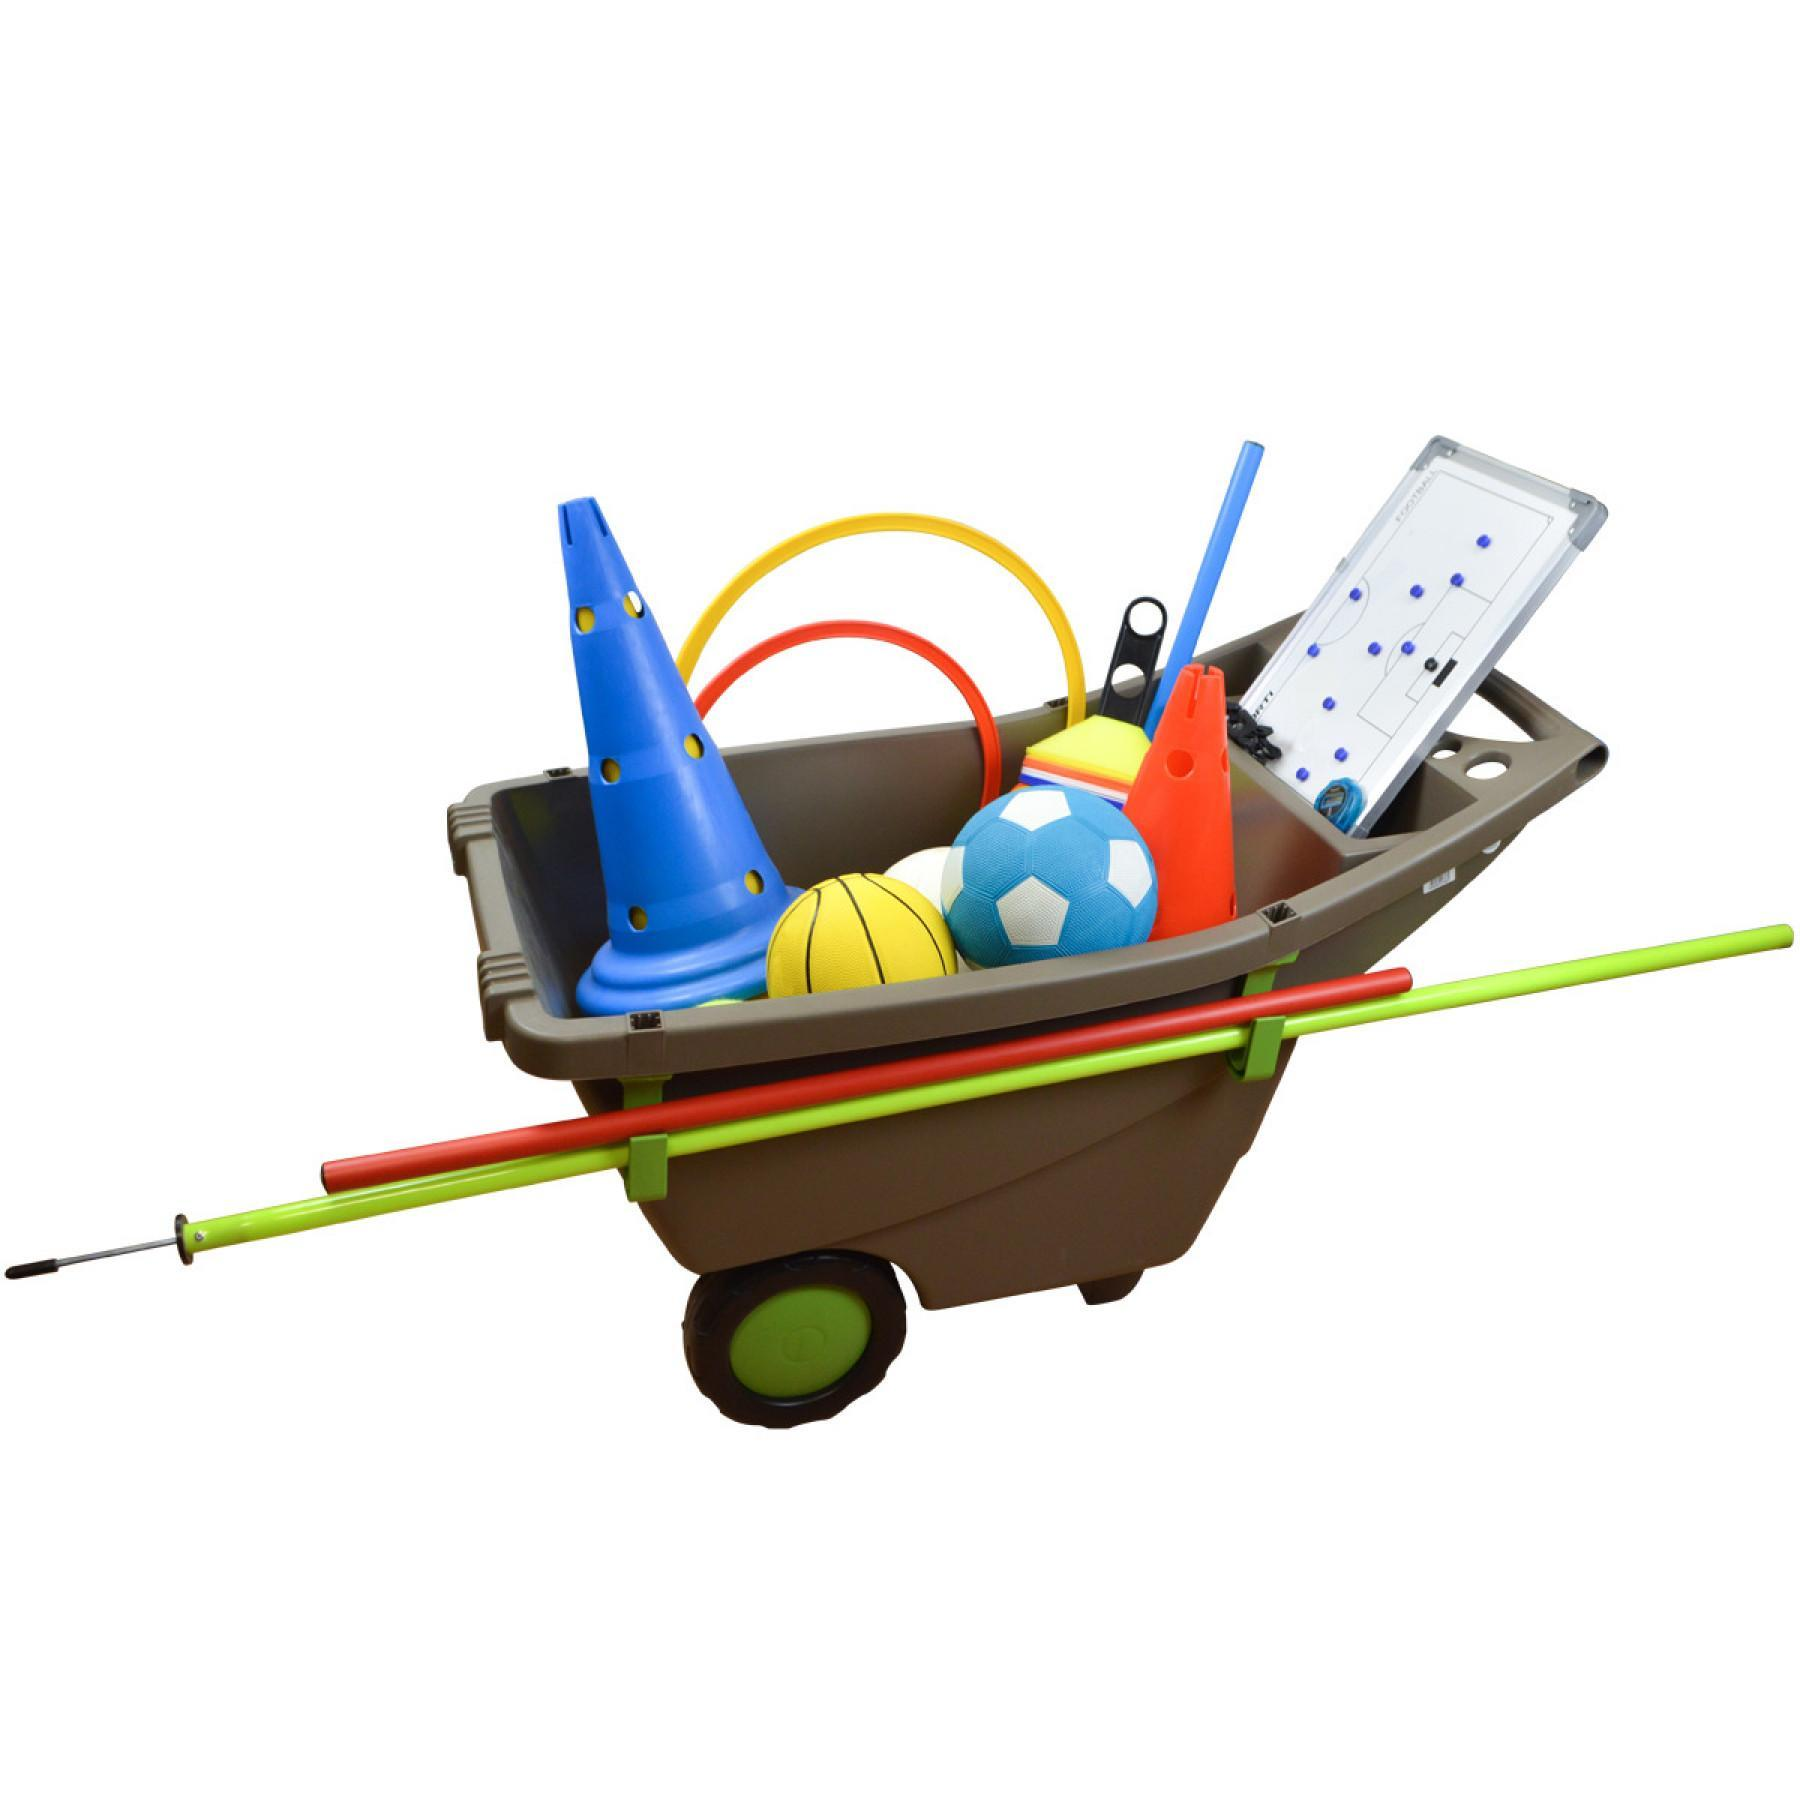 Transport wheelbarrow Sporti France